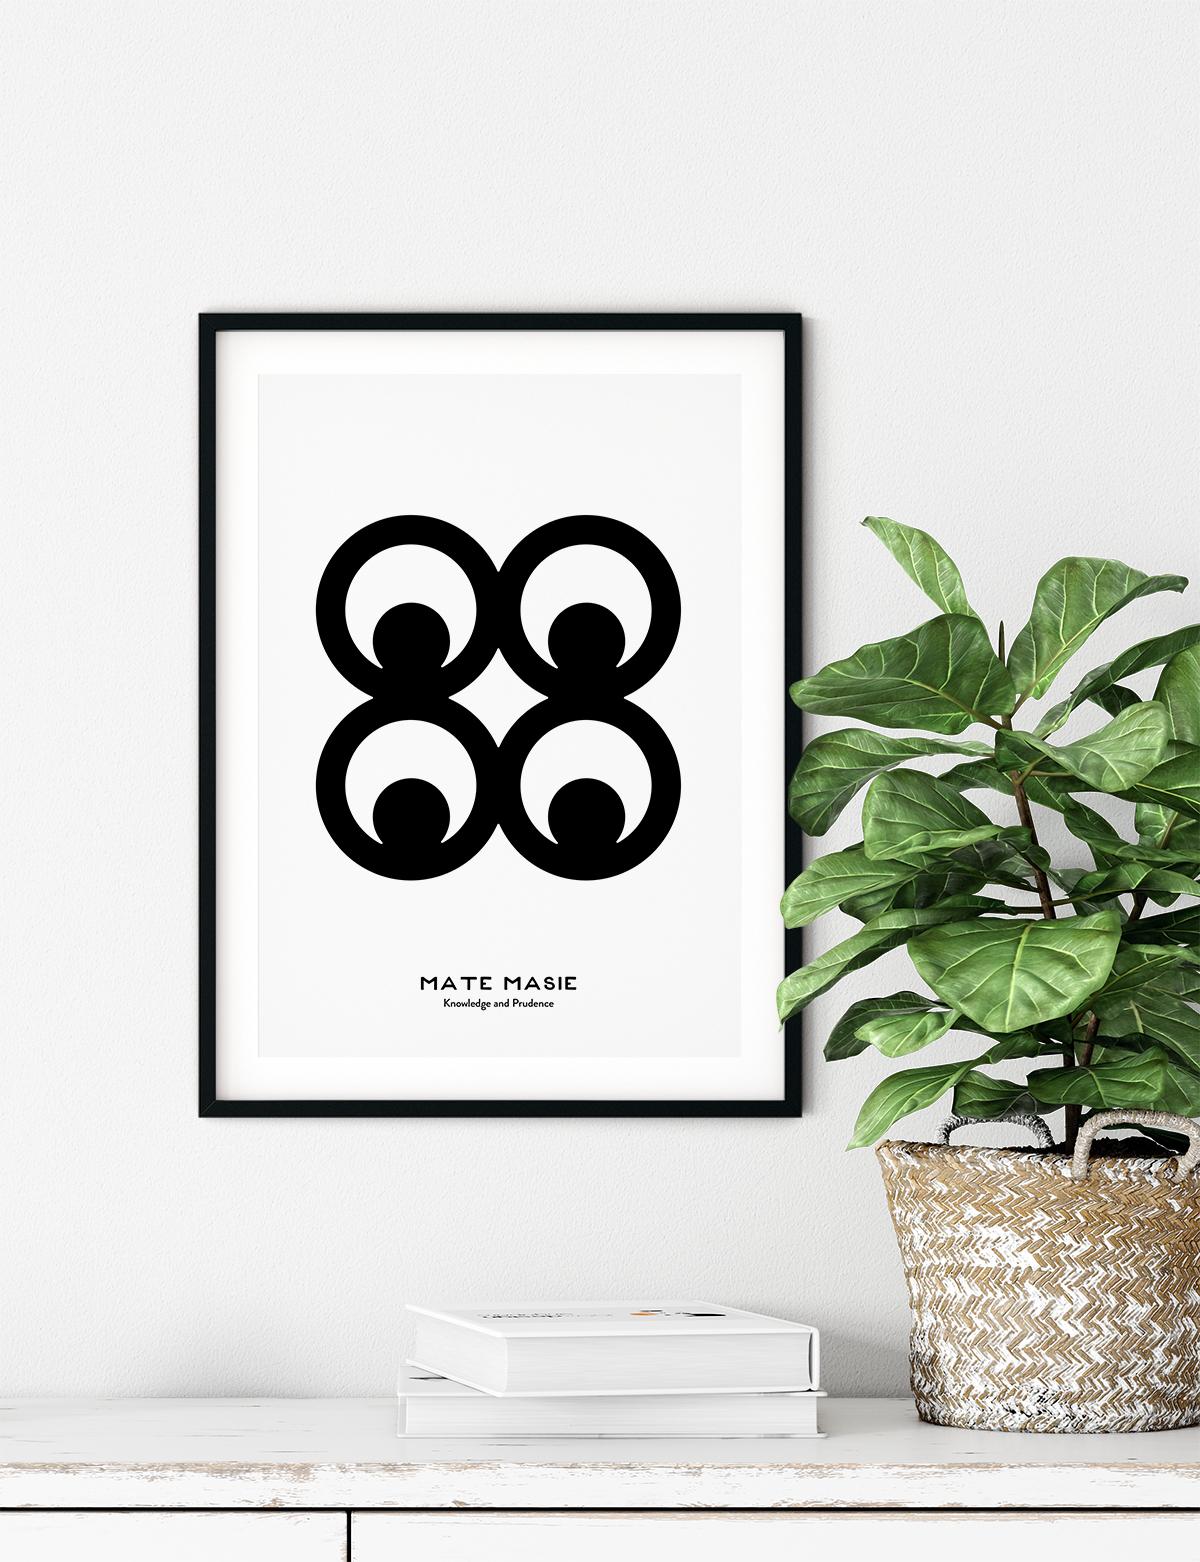 Mate Masie, Adinkra Symbol, African Art Print